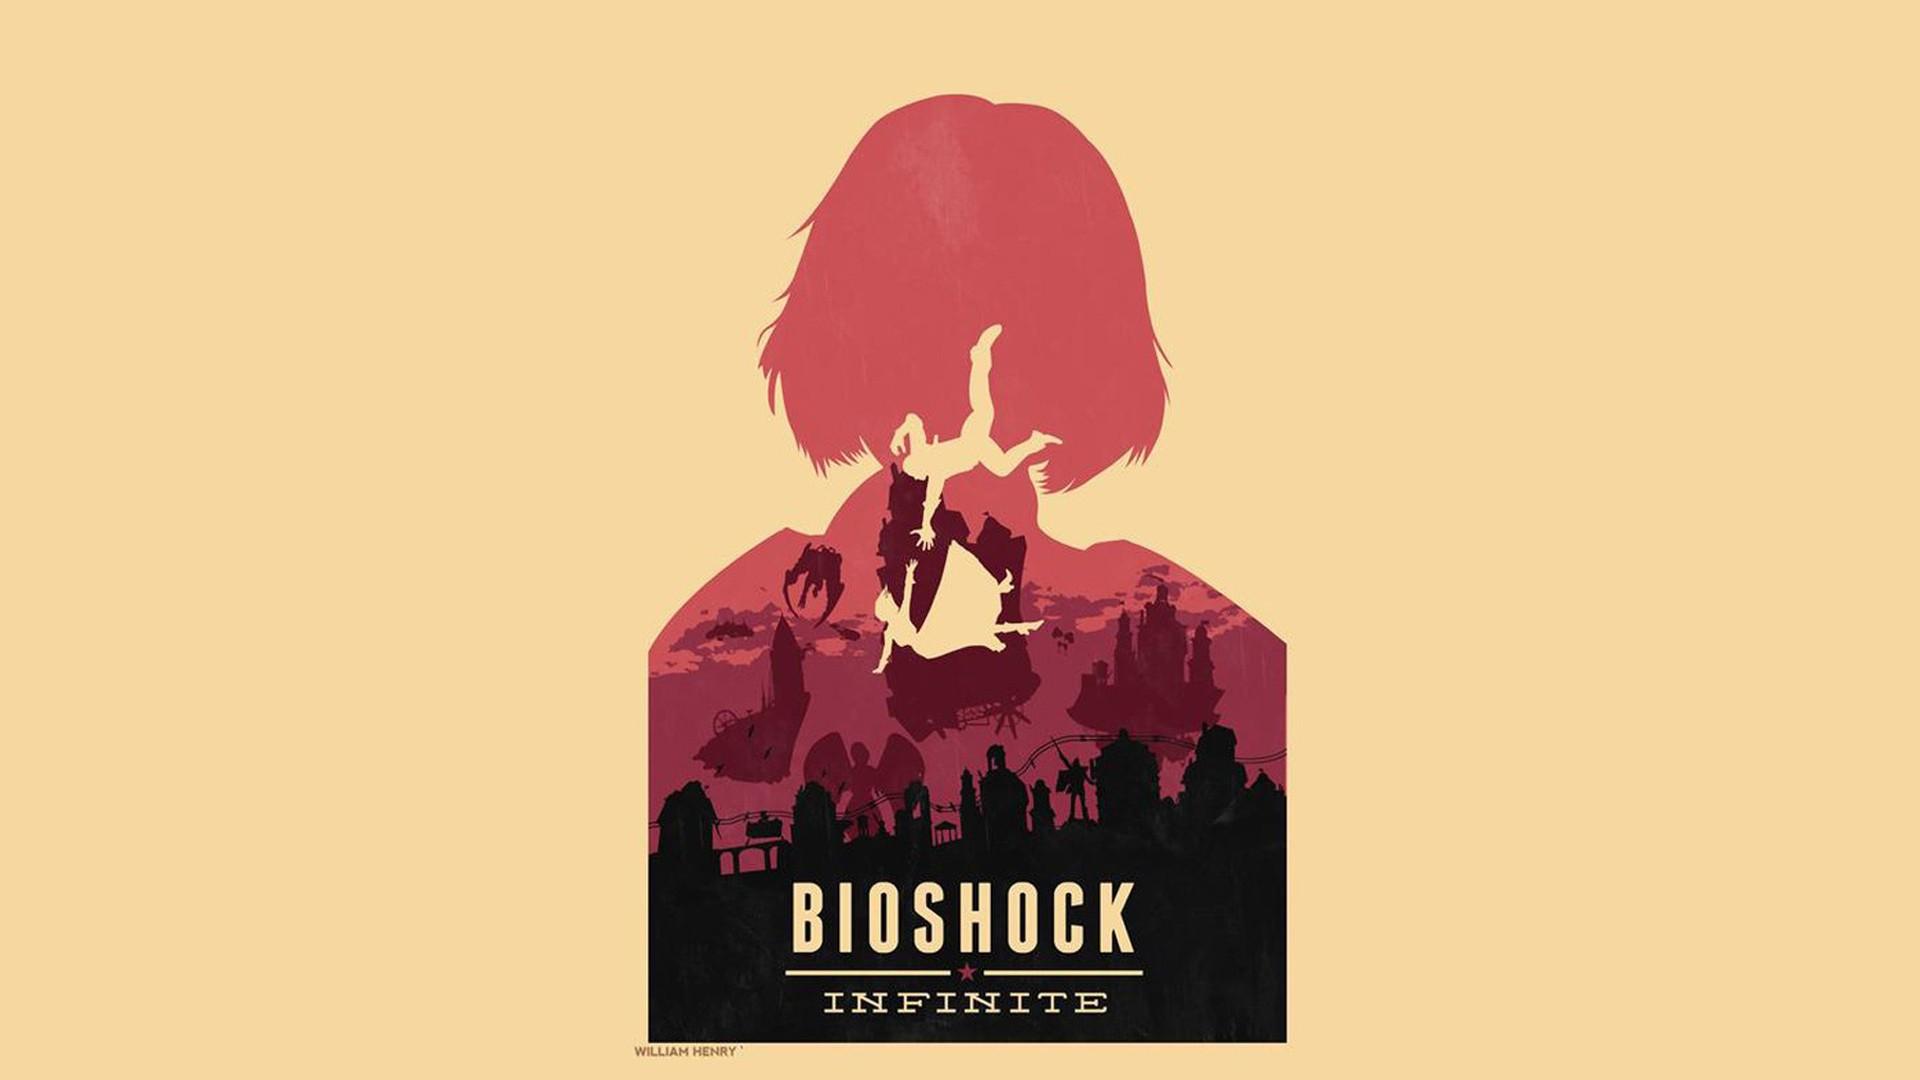 bioshock infinite картинки на рабочий стол